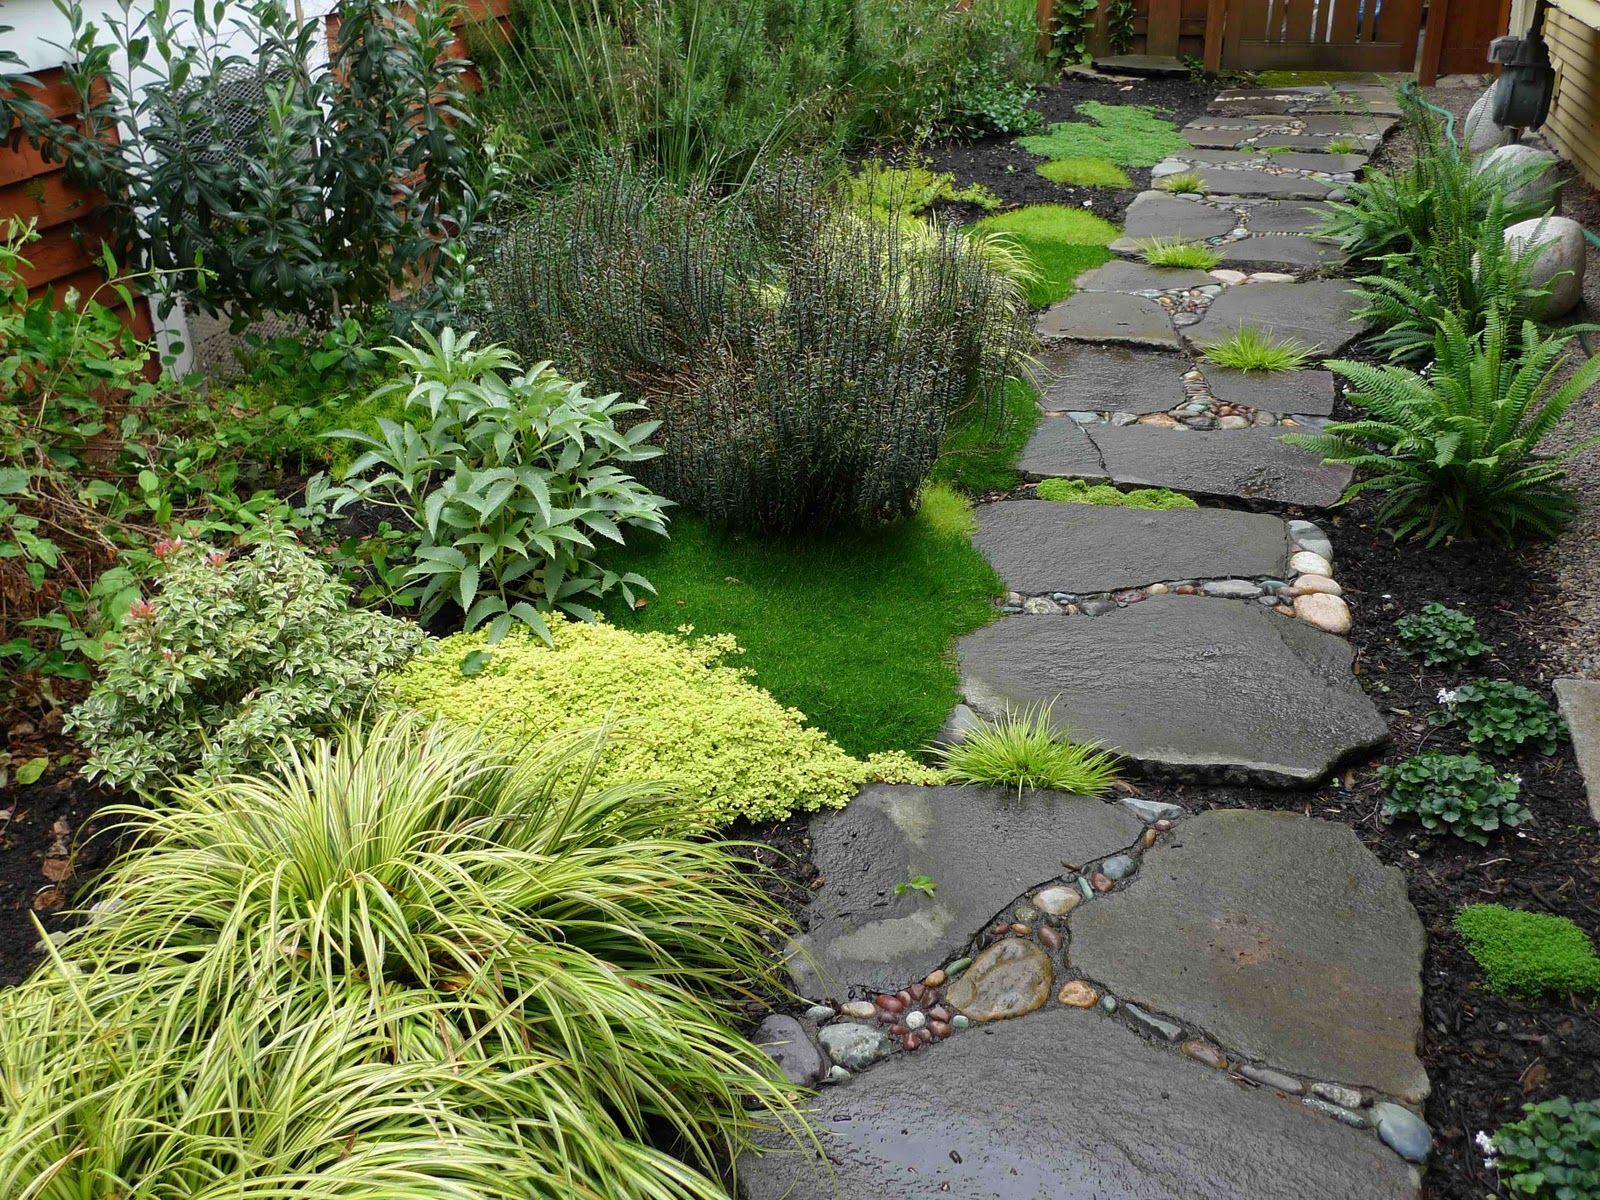 Walkway garden ideas pinterest for Plants for walkway landscaping ideas